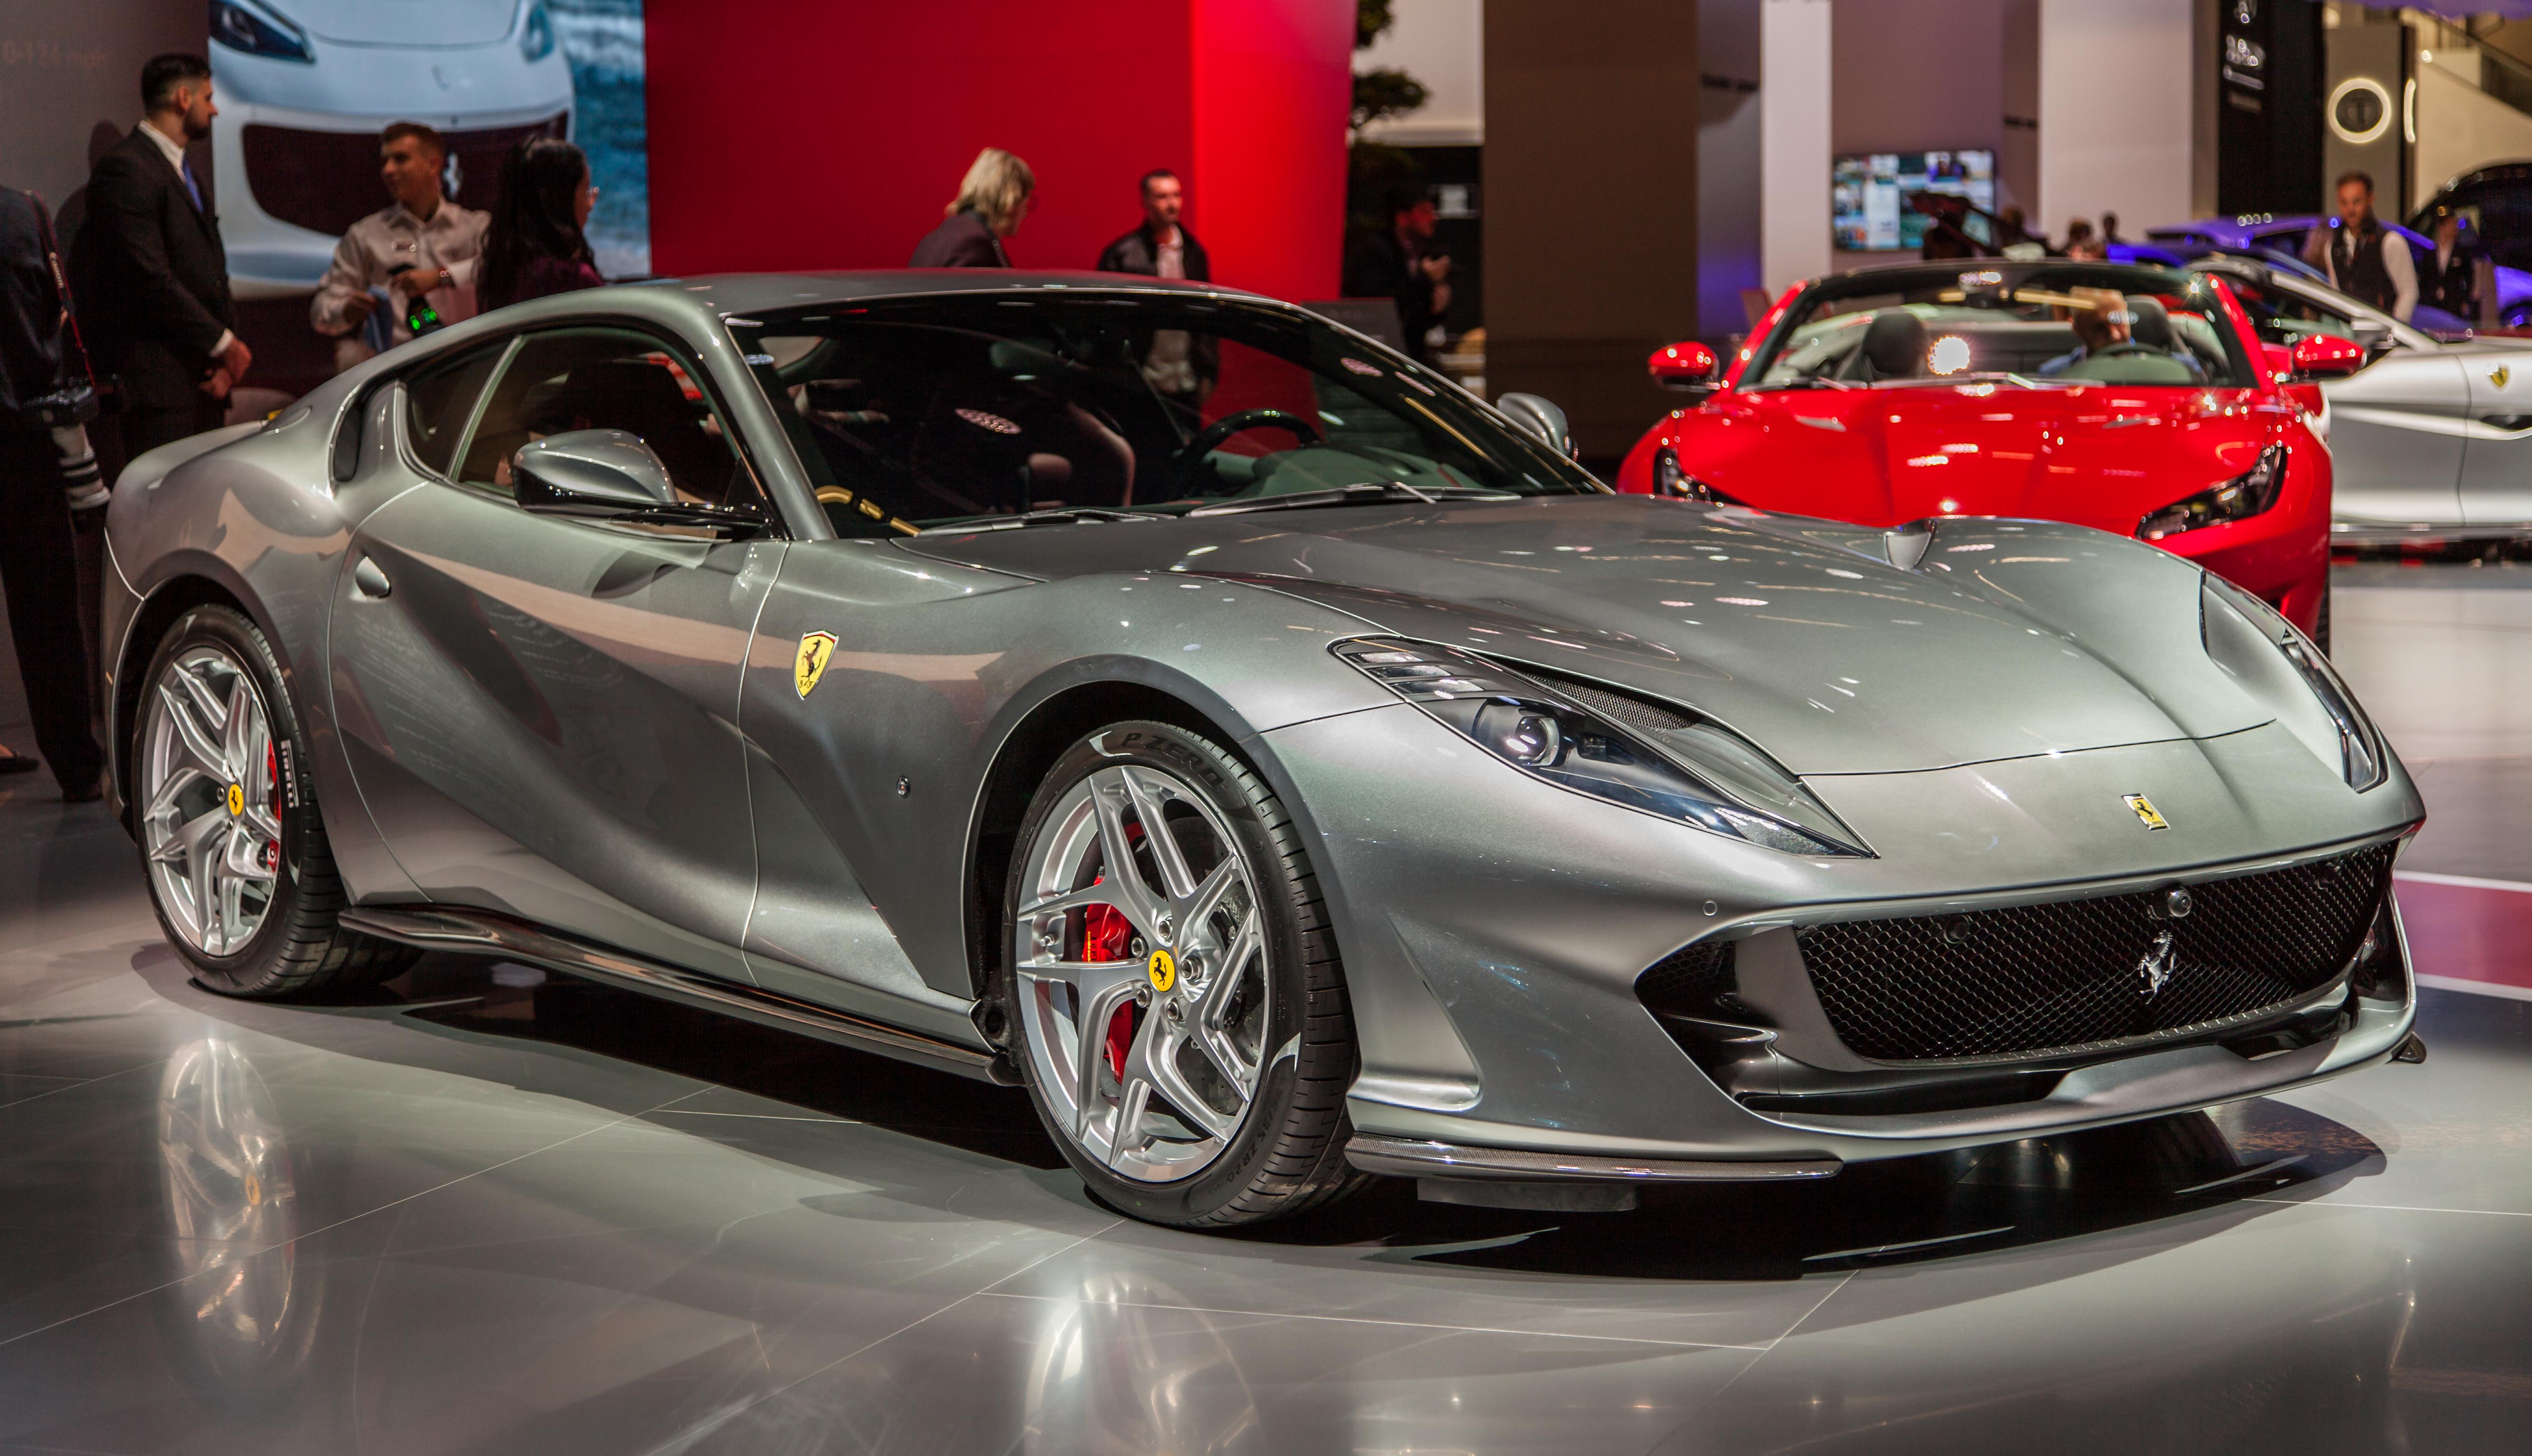 al sale of at complex ferrari used for dubai just the italia and awir car cars some cheap corvette market